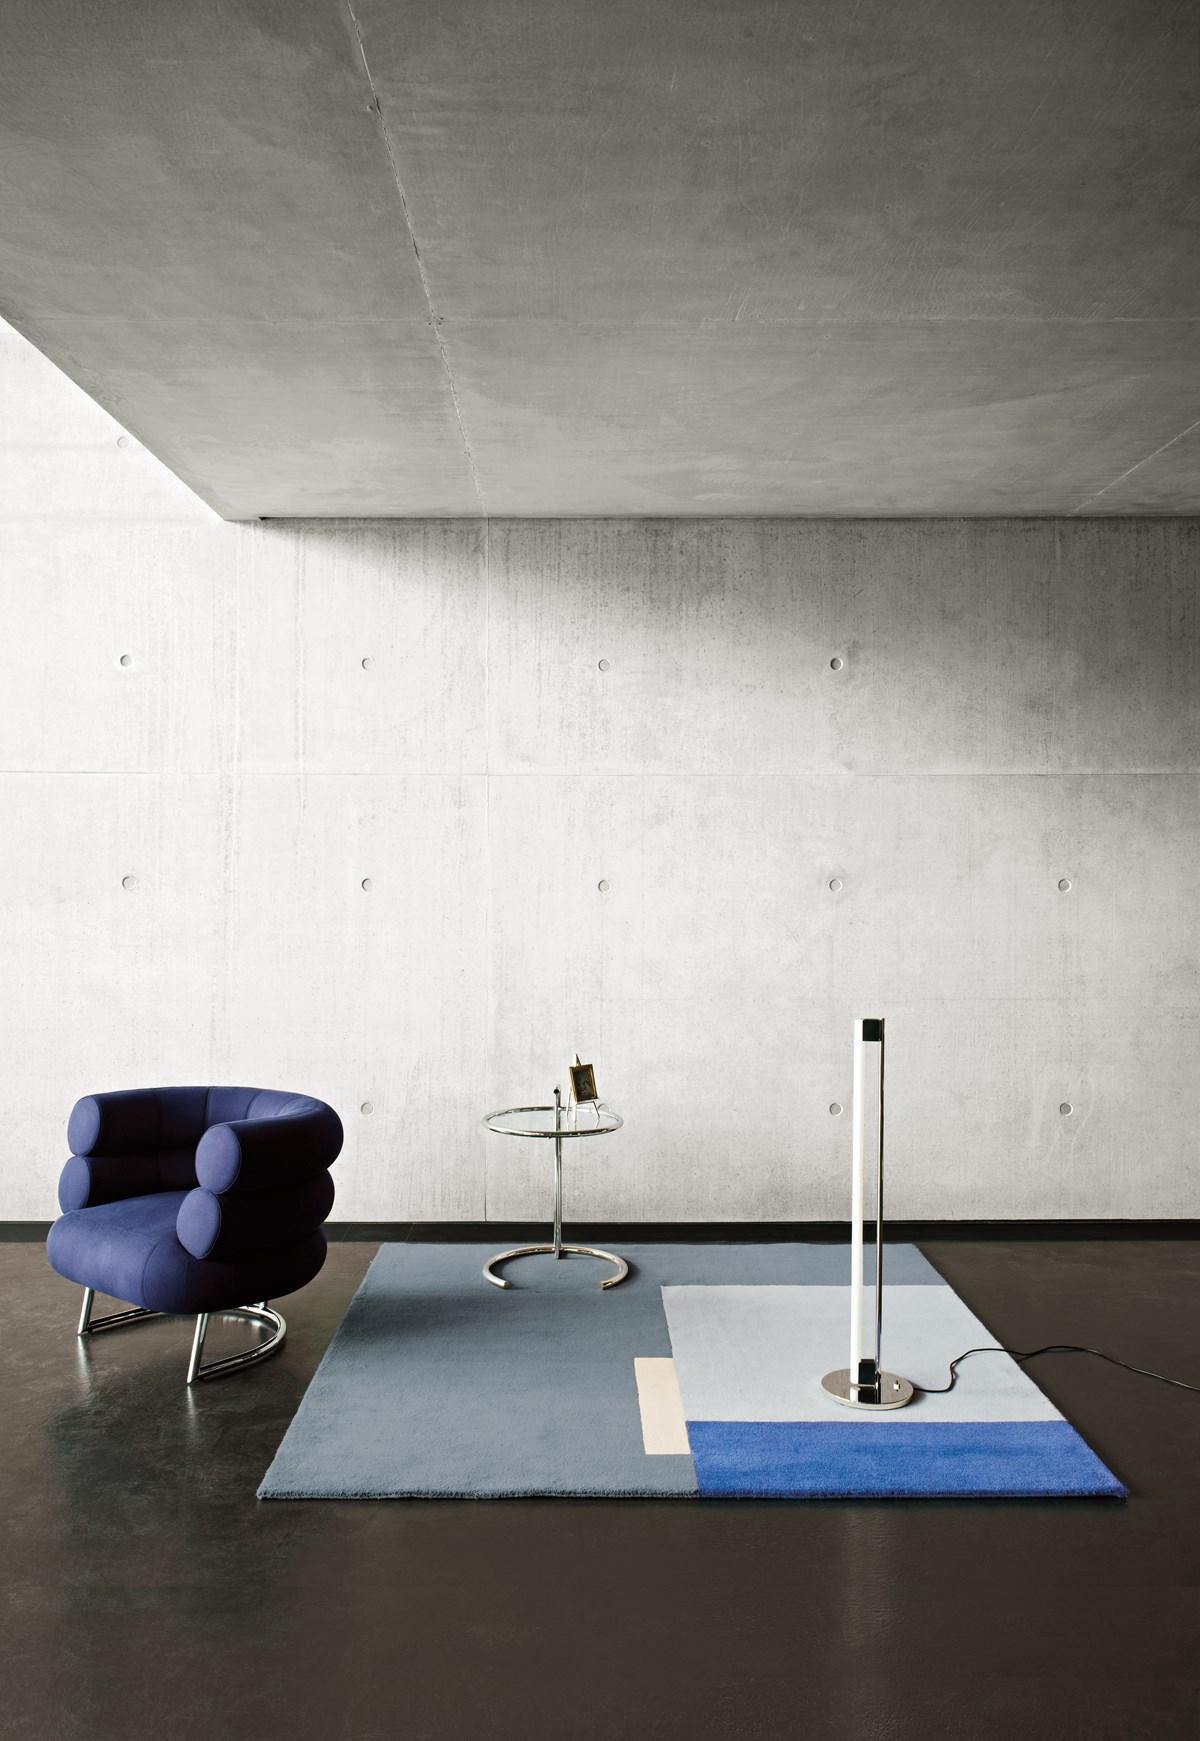 Classicon Bibendum Armchair Roquebrune Rug Adjustable Table E 1027 Tube Light Floor Lamp Photo Seelen